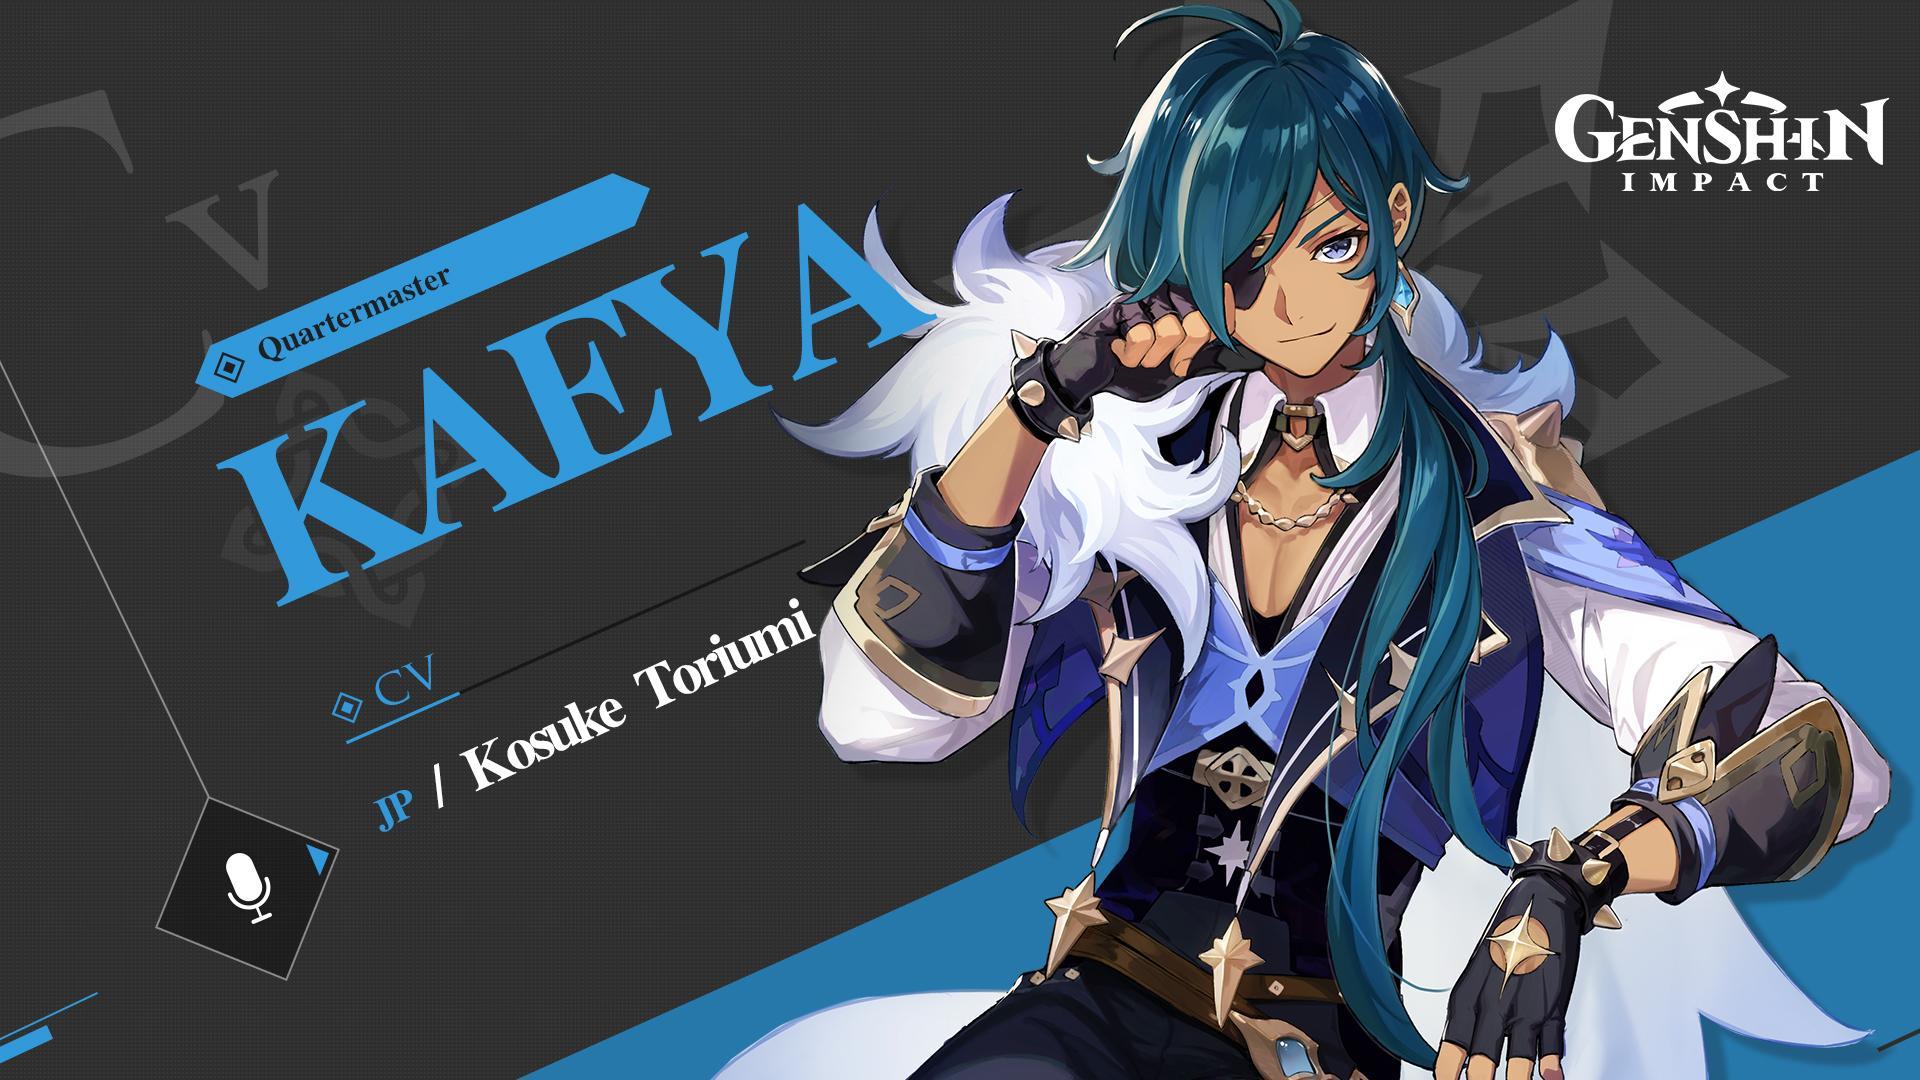 Genshin Impact Japanese character voices Kaeya